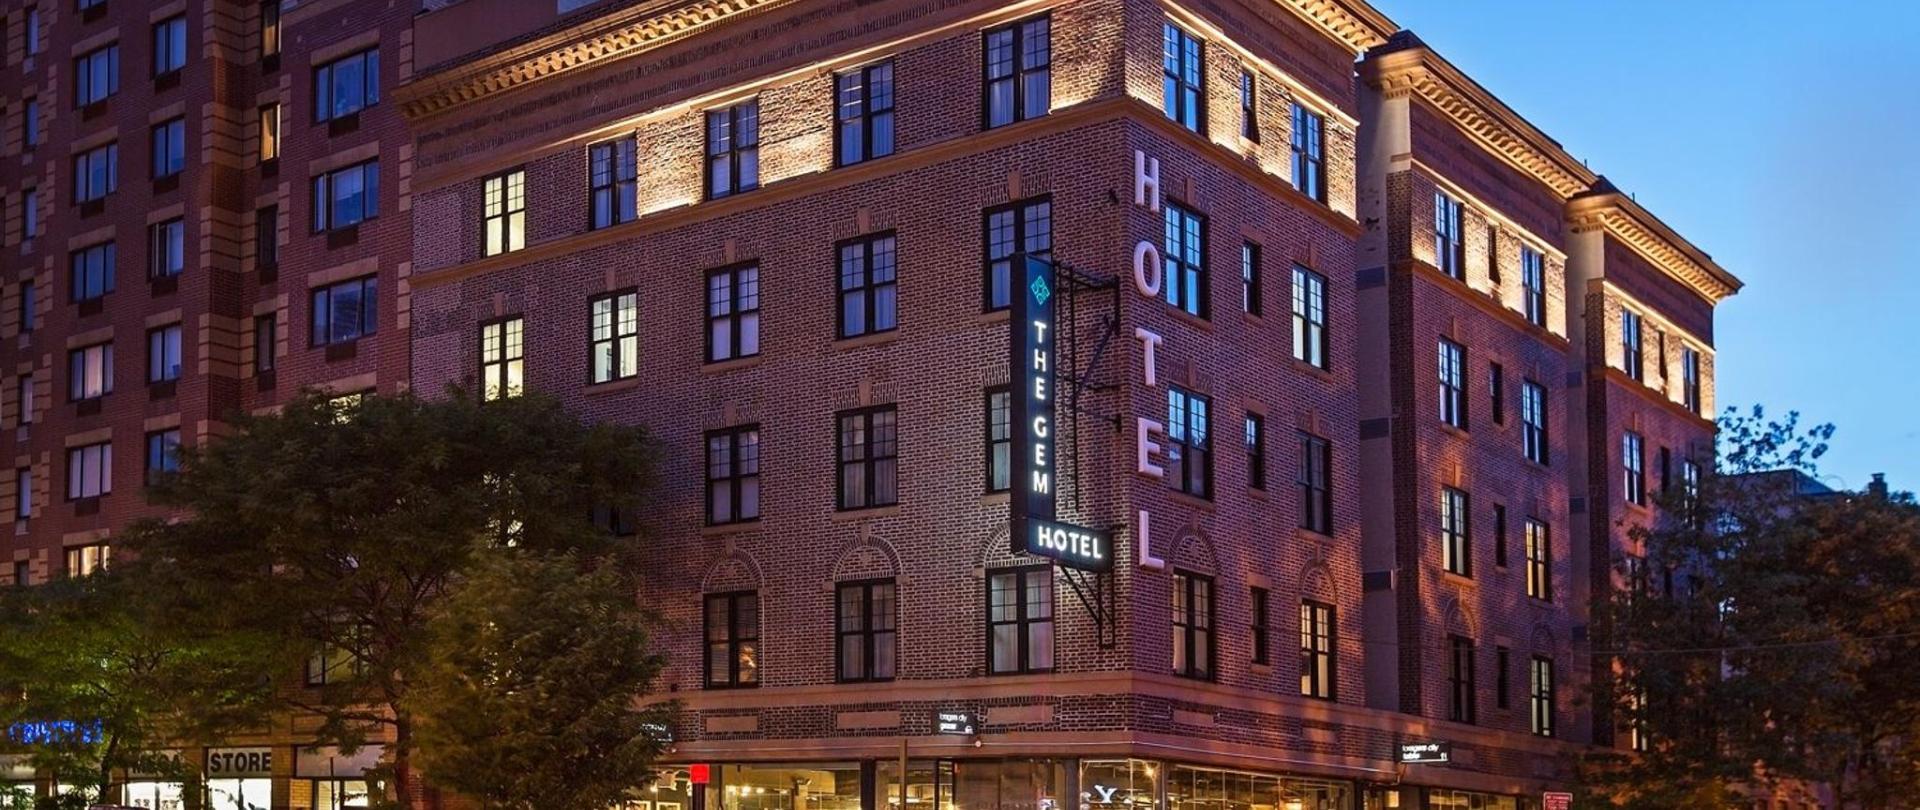 the-gem-hotel-chelsea-exterior.jpg